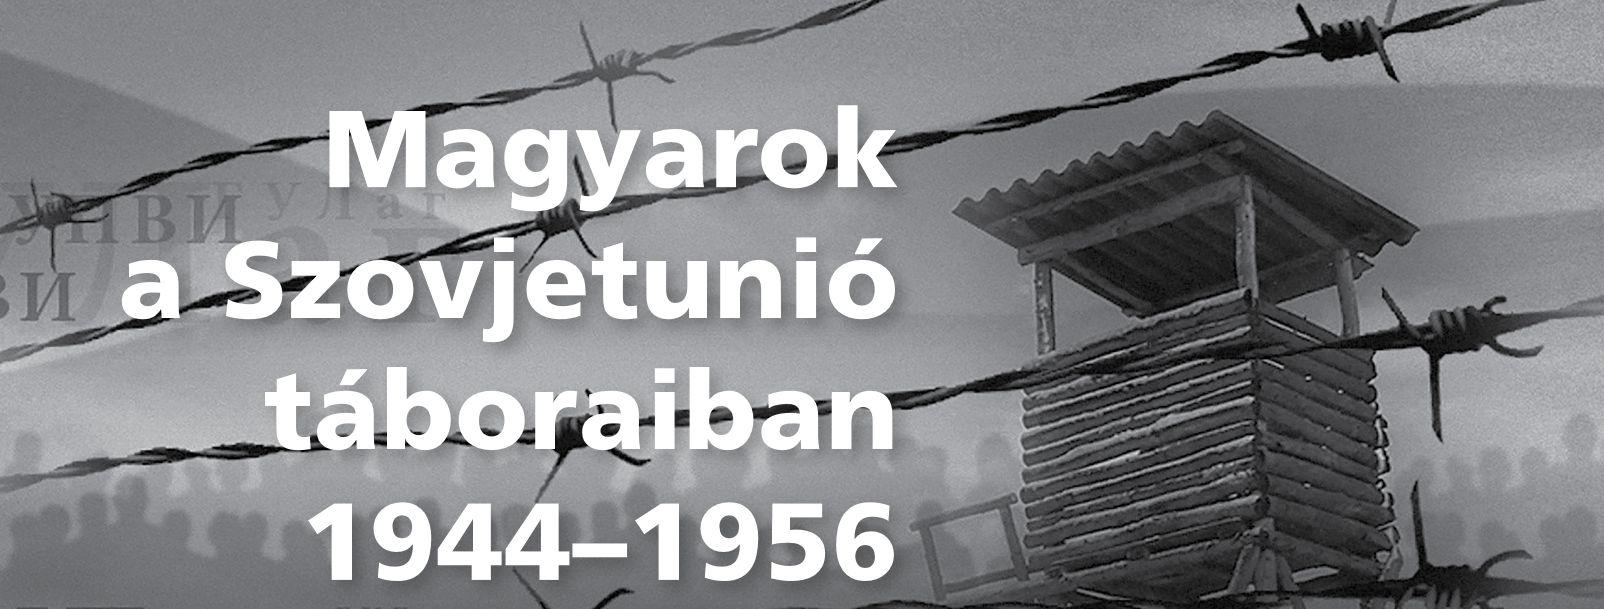 gulag_2016.jpg